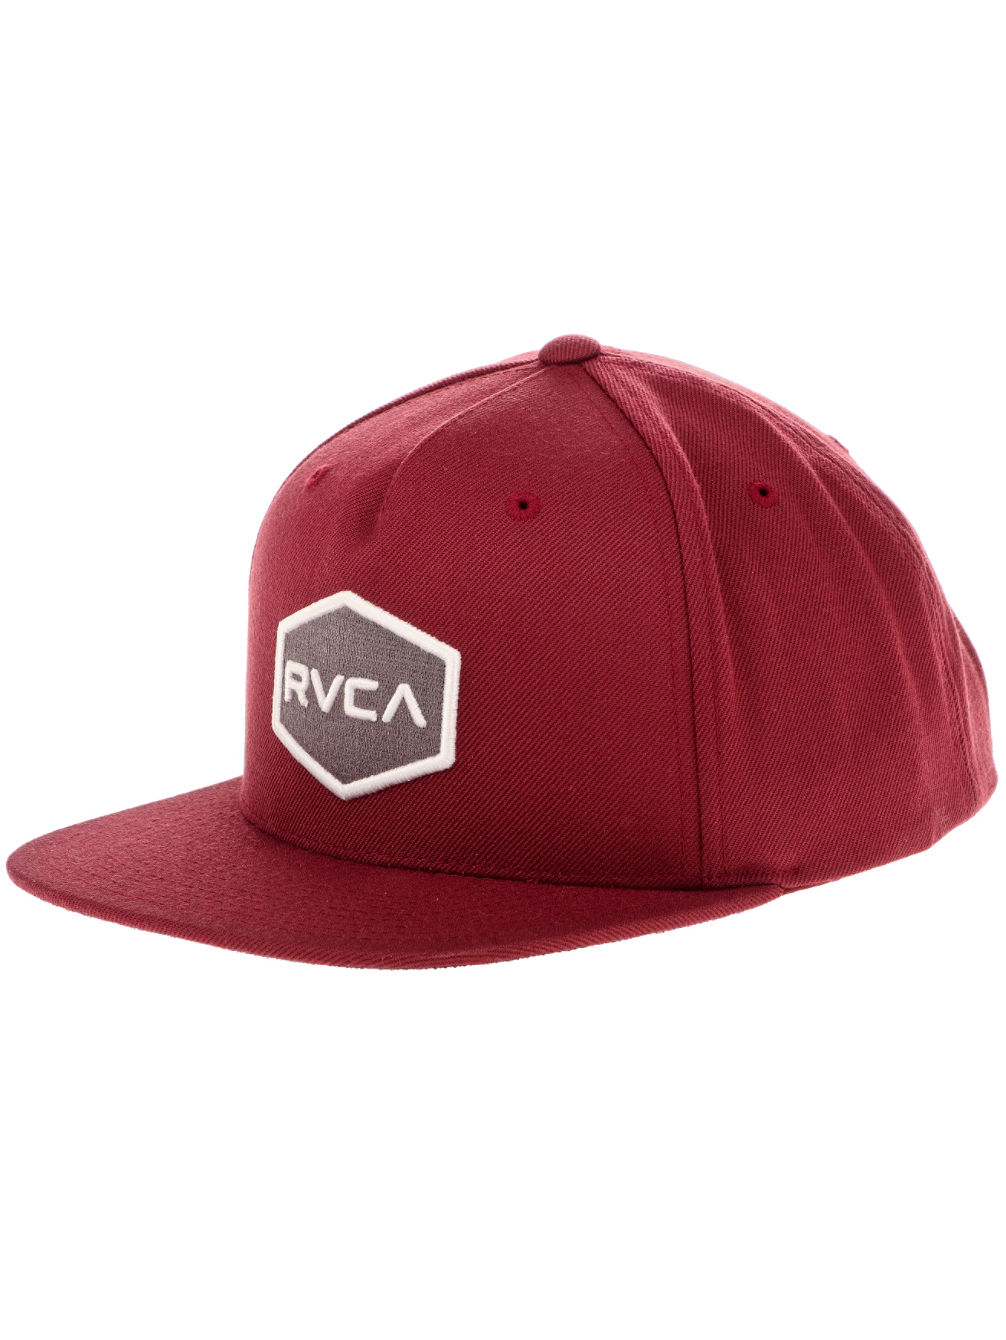 rvca-commonwealth-snapback-cap